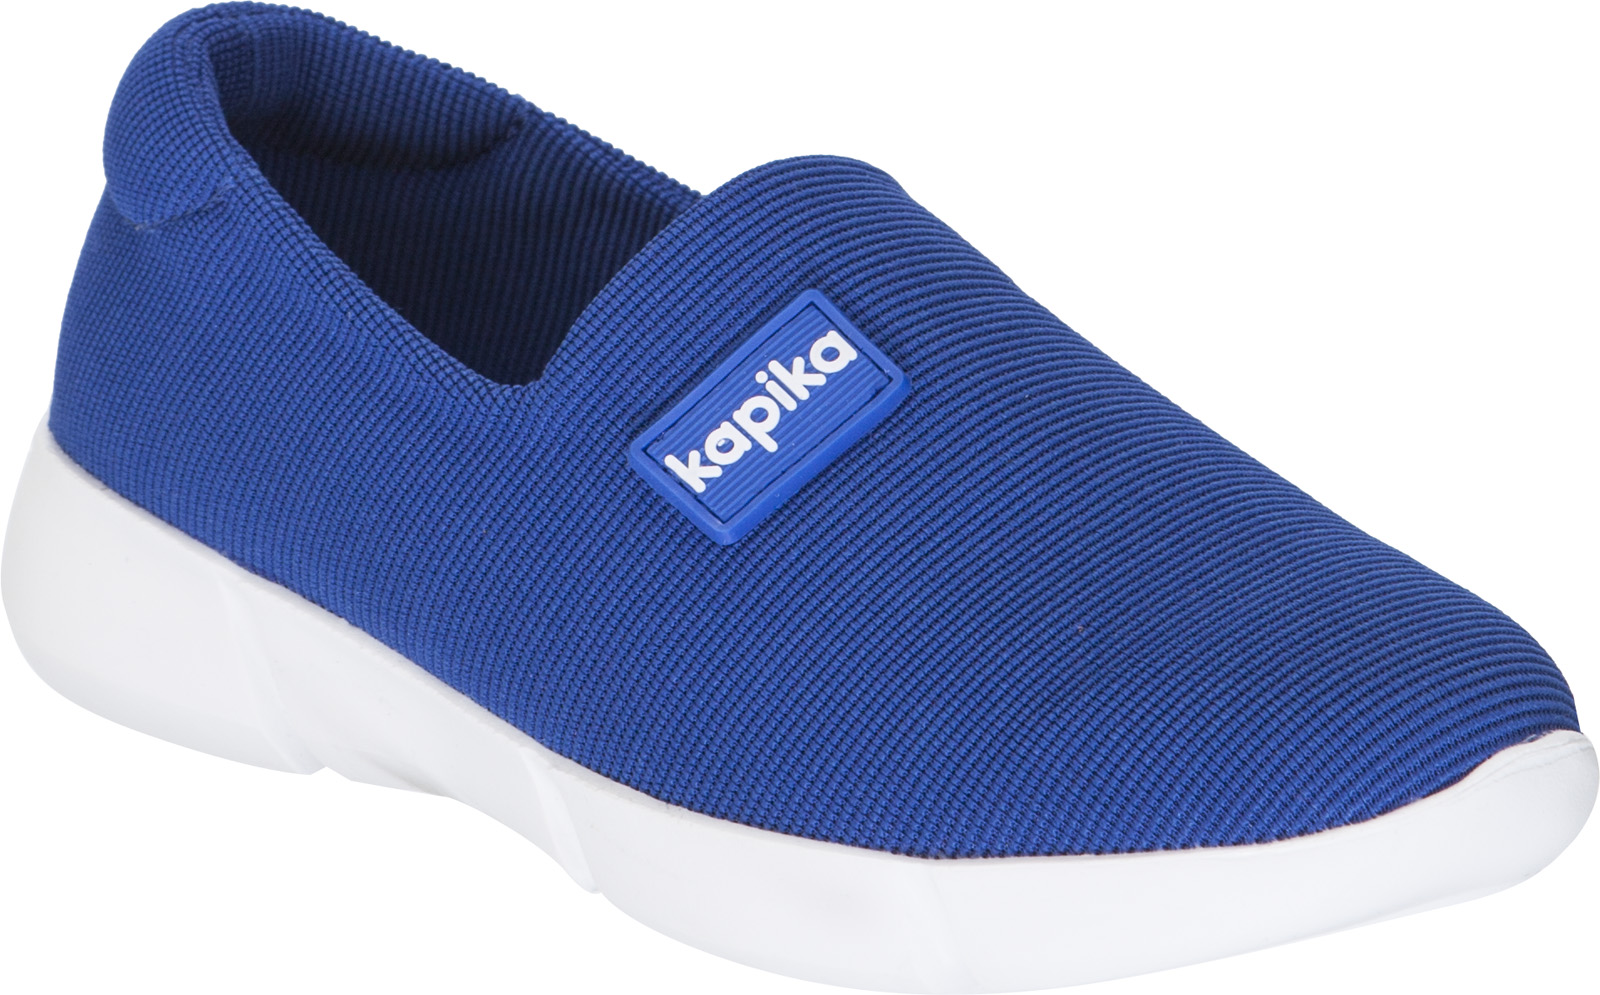 Кроссовки для девочки Kapika, цвет: синий. 73276-4. Размер 3573276-4